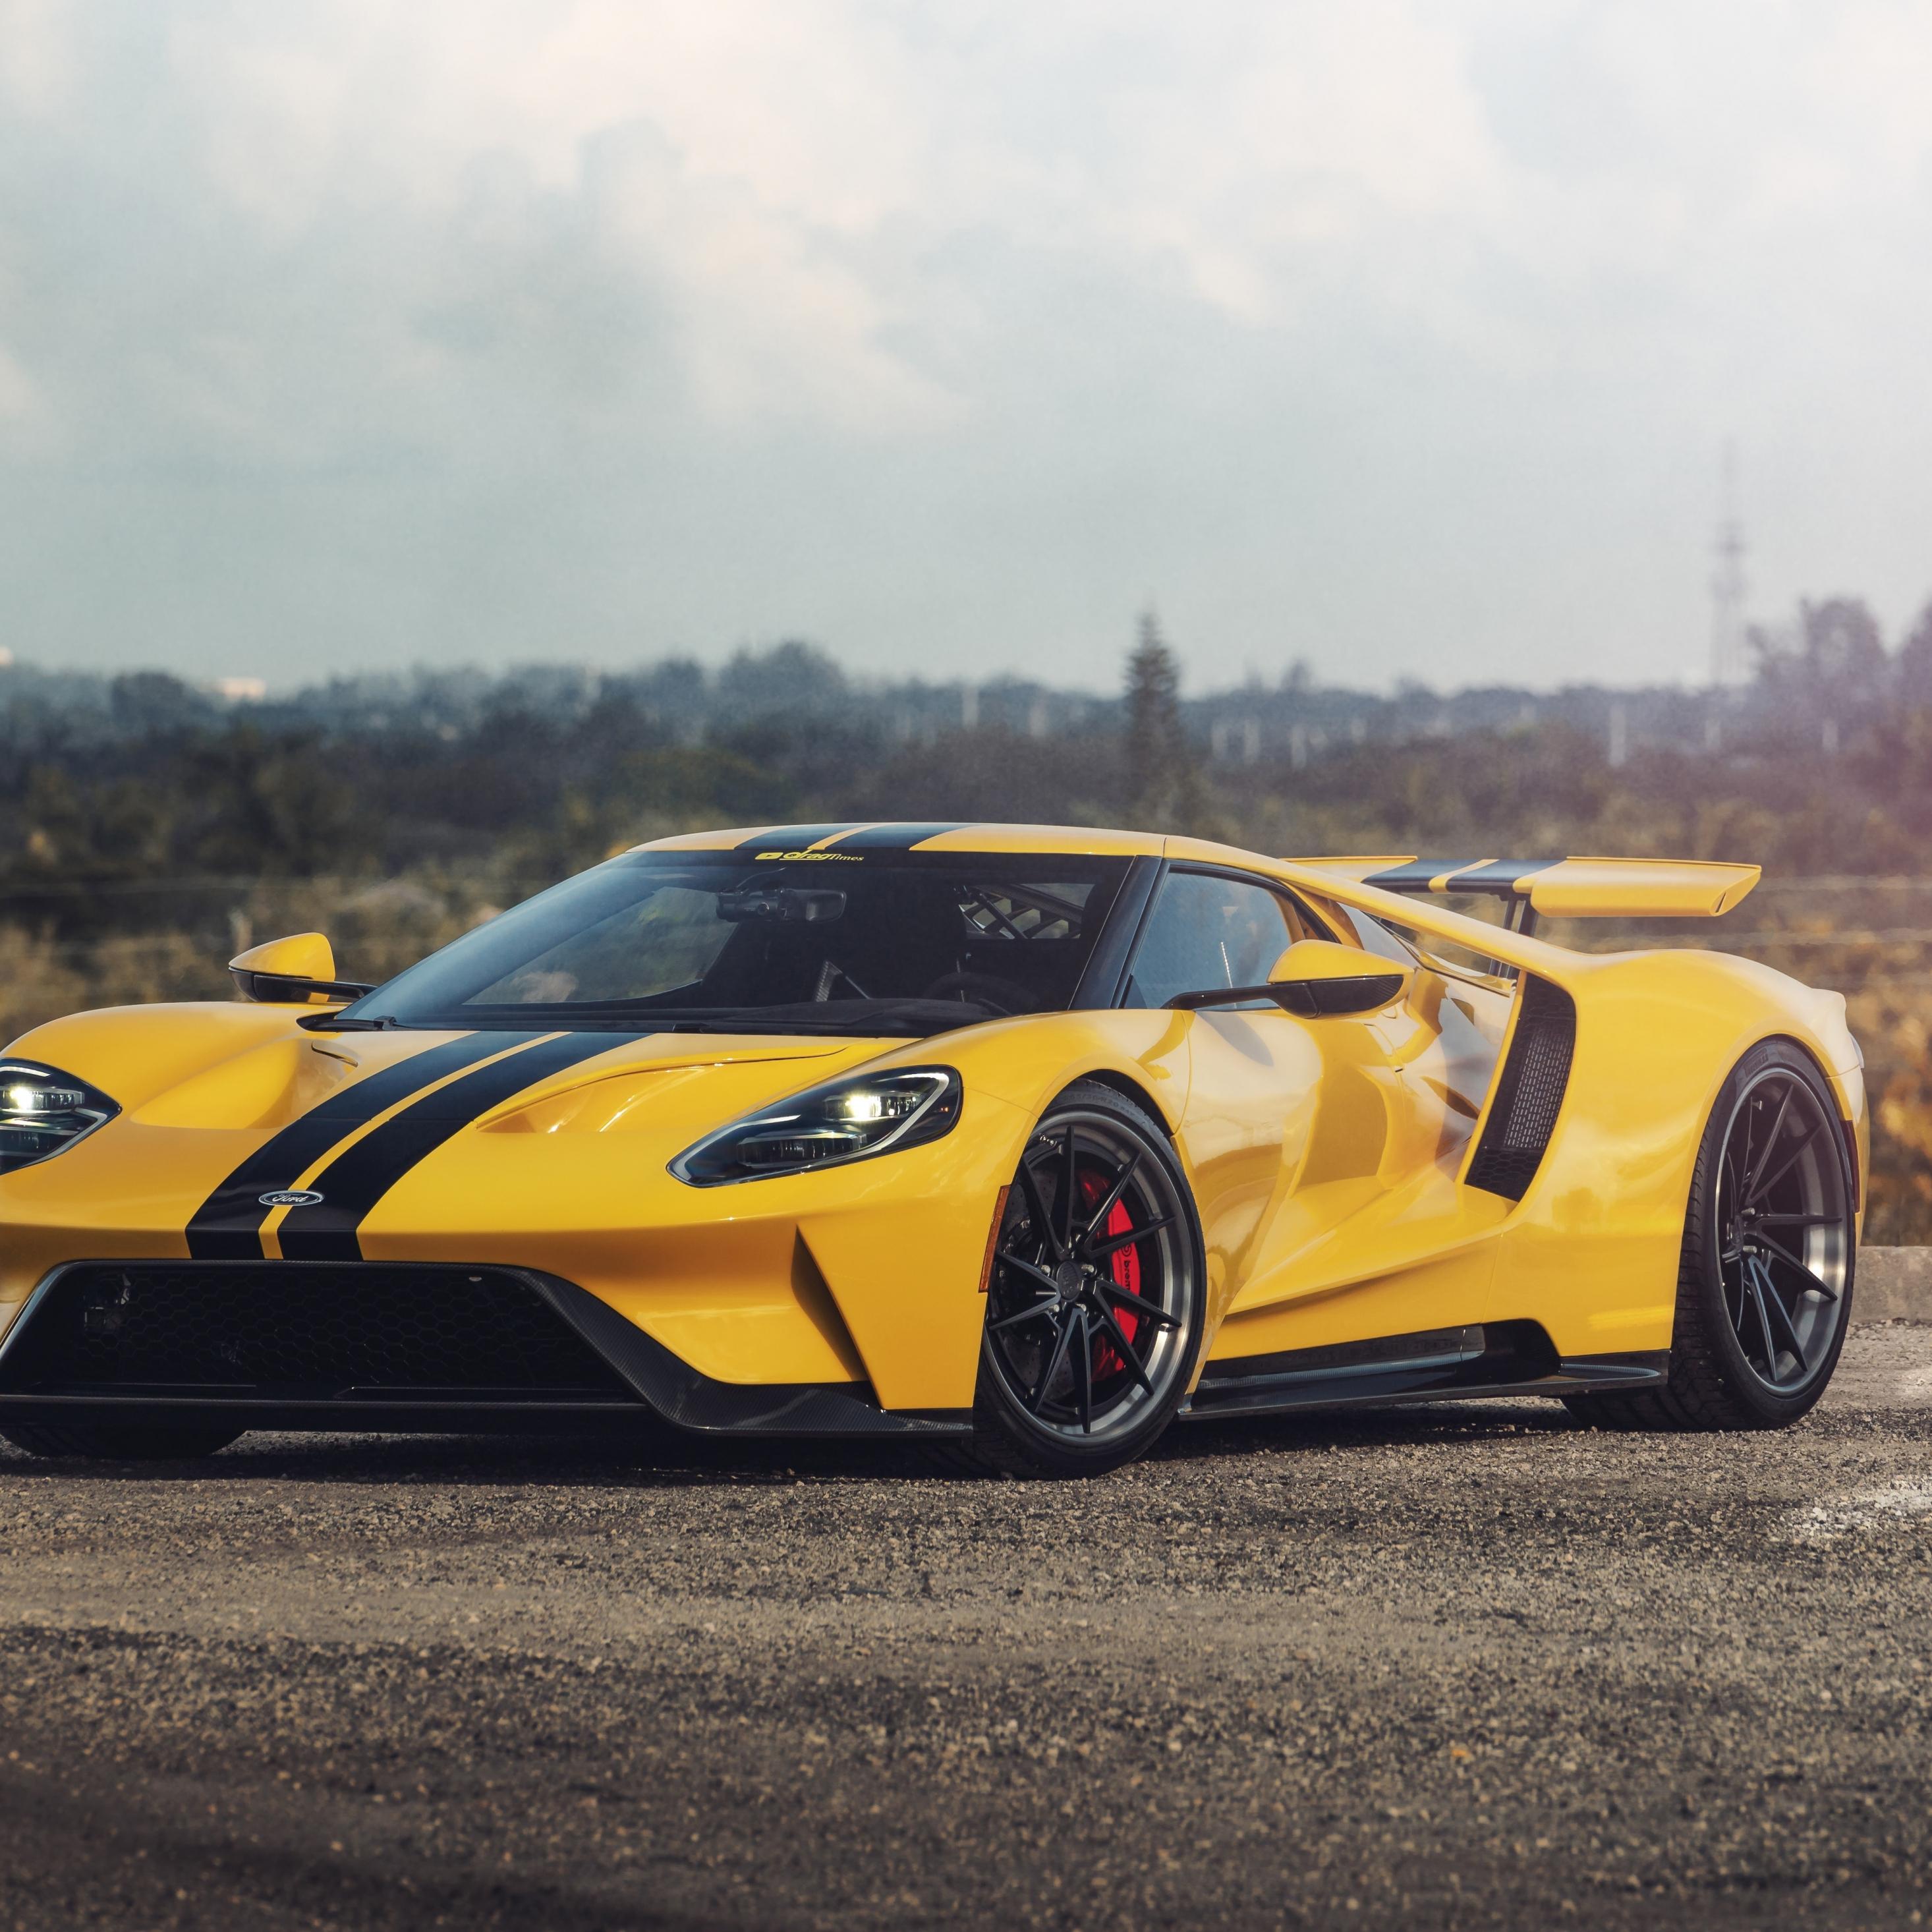 Download 2932x2932 Wallpaper Sports Car Ford Gt 2019